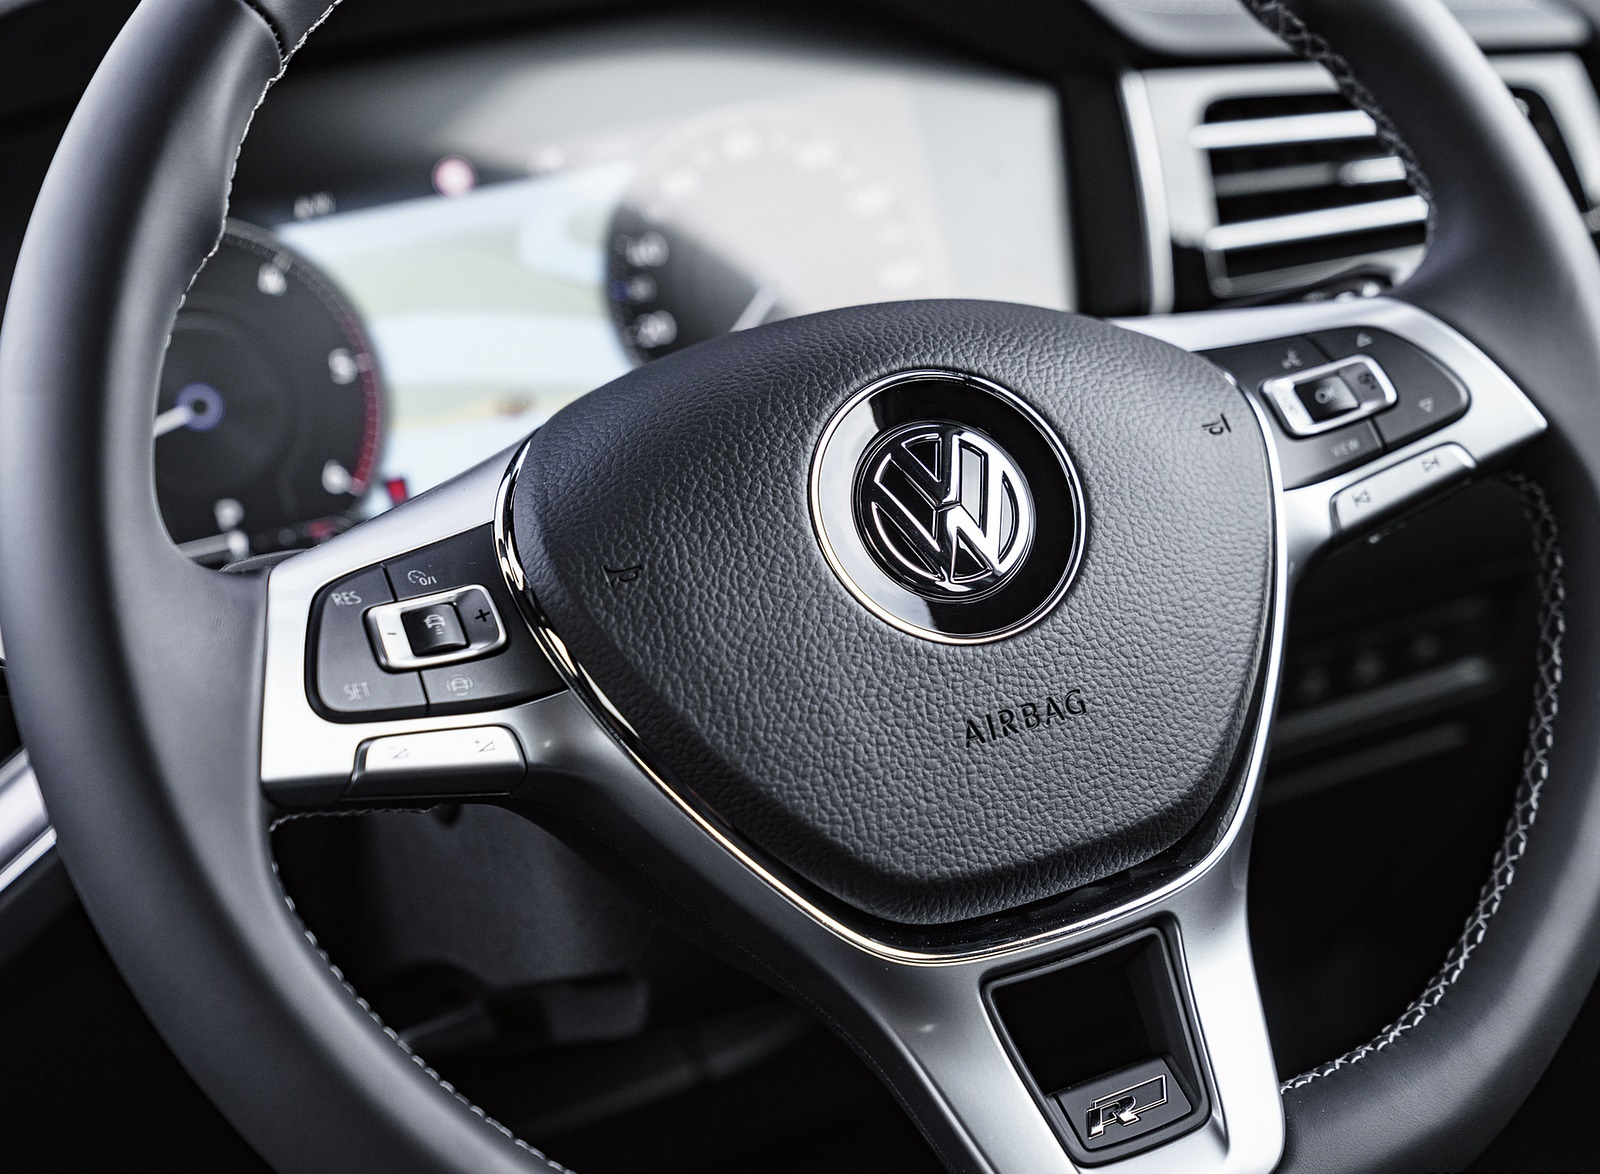 2019 Volkswagen Touareg V6 TDI R-Line (UK-Spec) Interior Steering Wheel Wallpaper #36 of 43